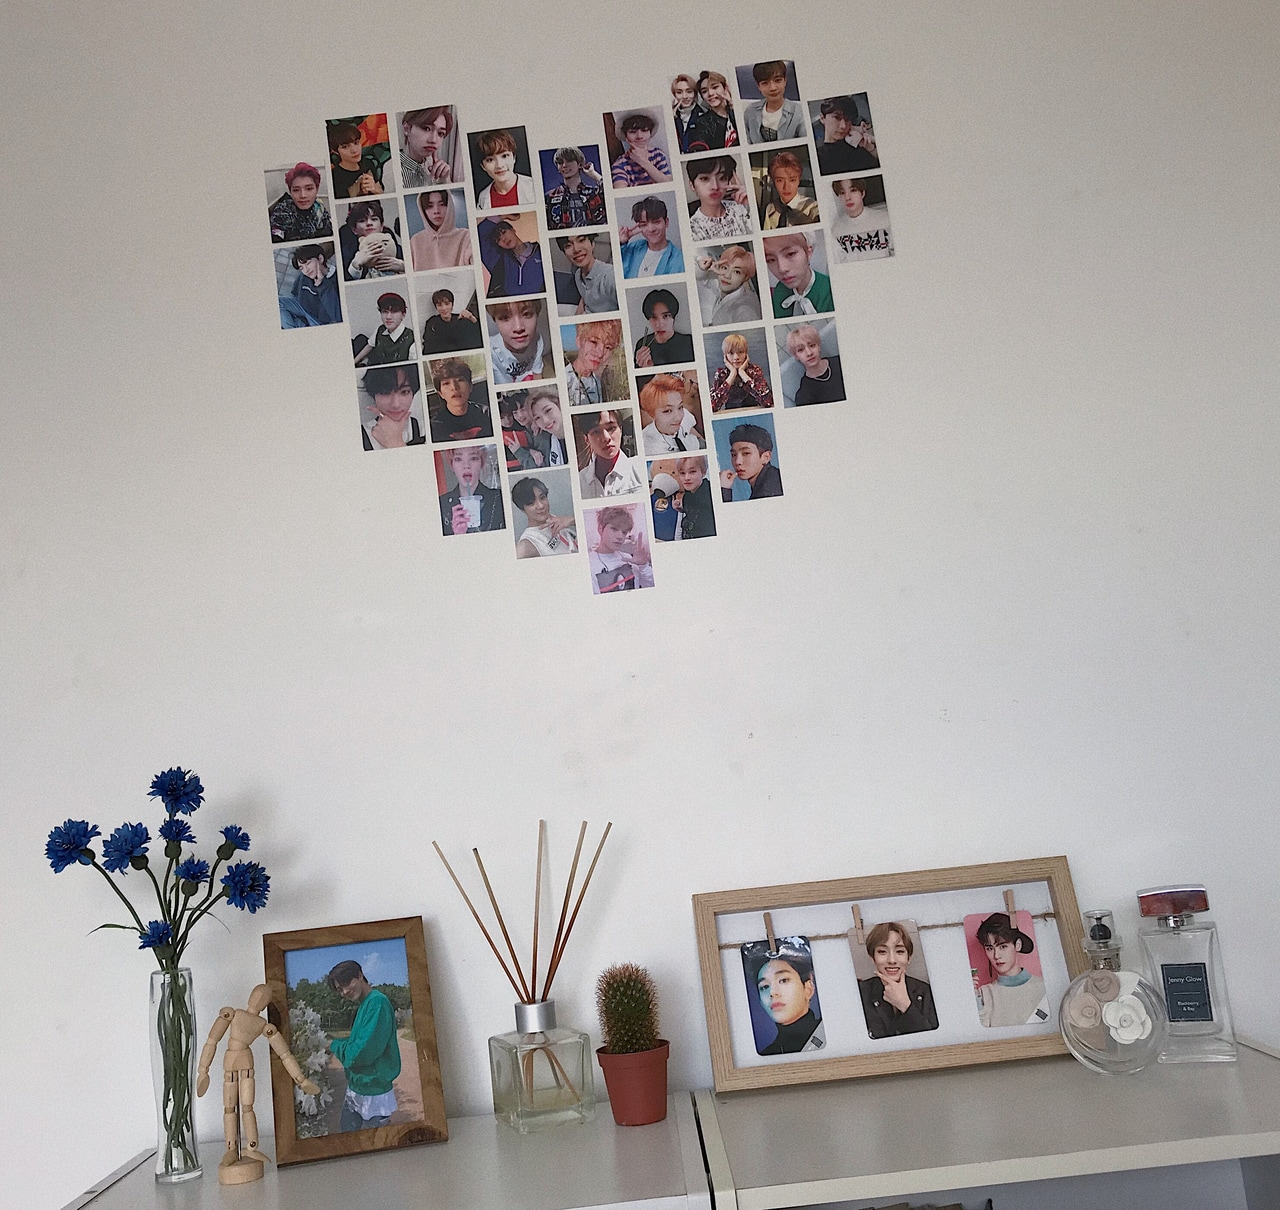 Aesthetic Kpop Room Decor On We Heart It